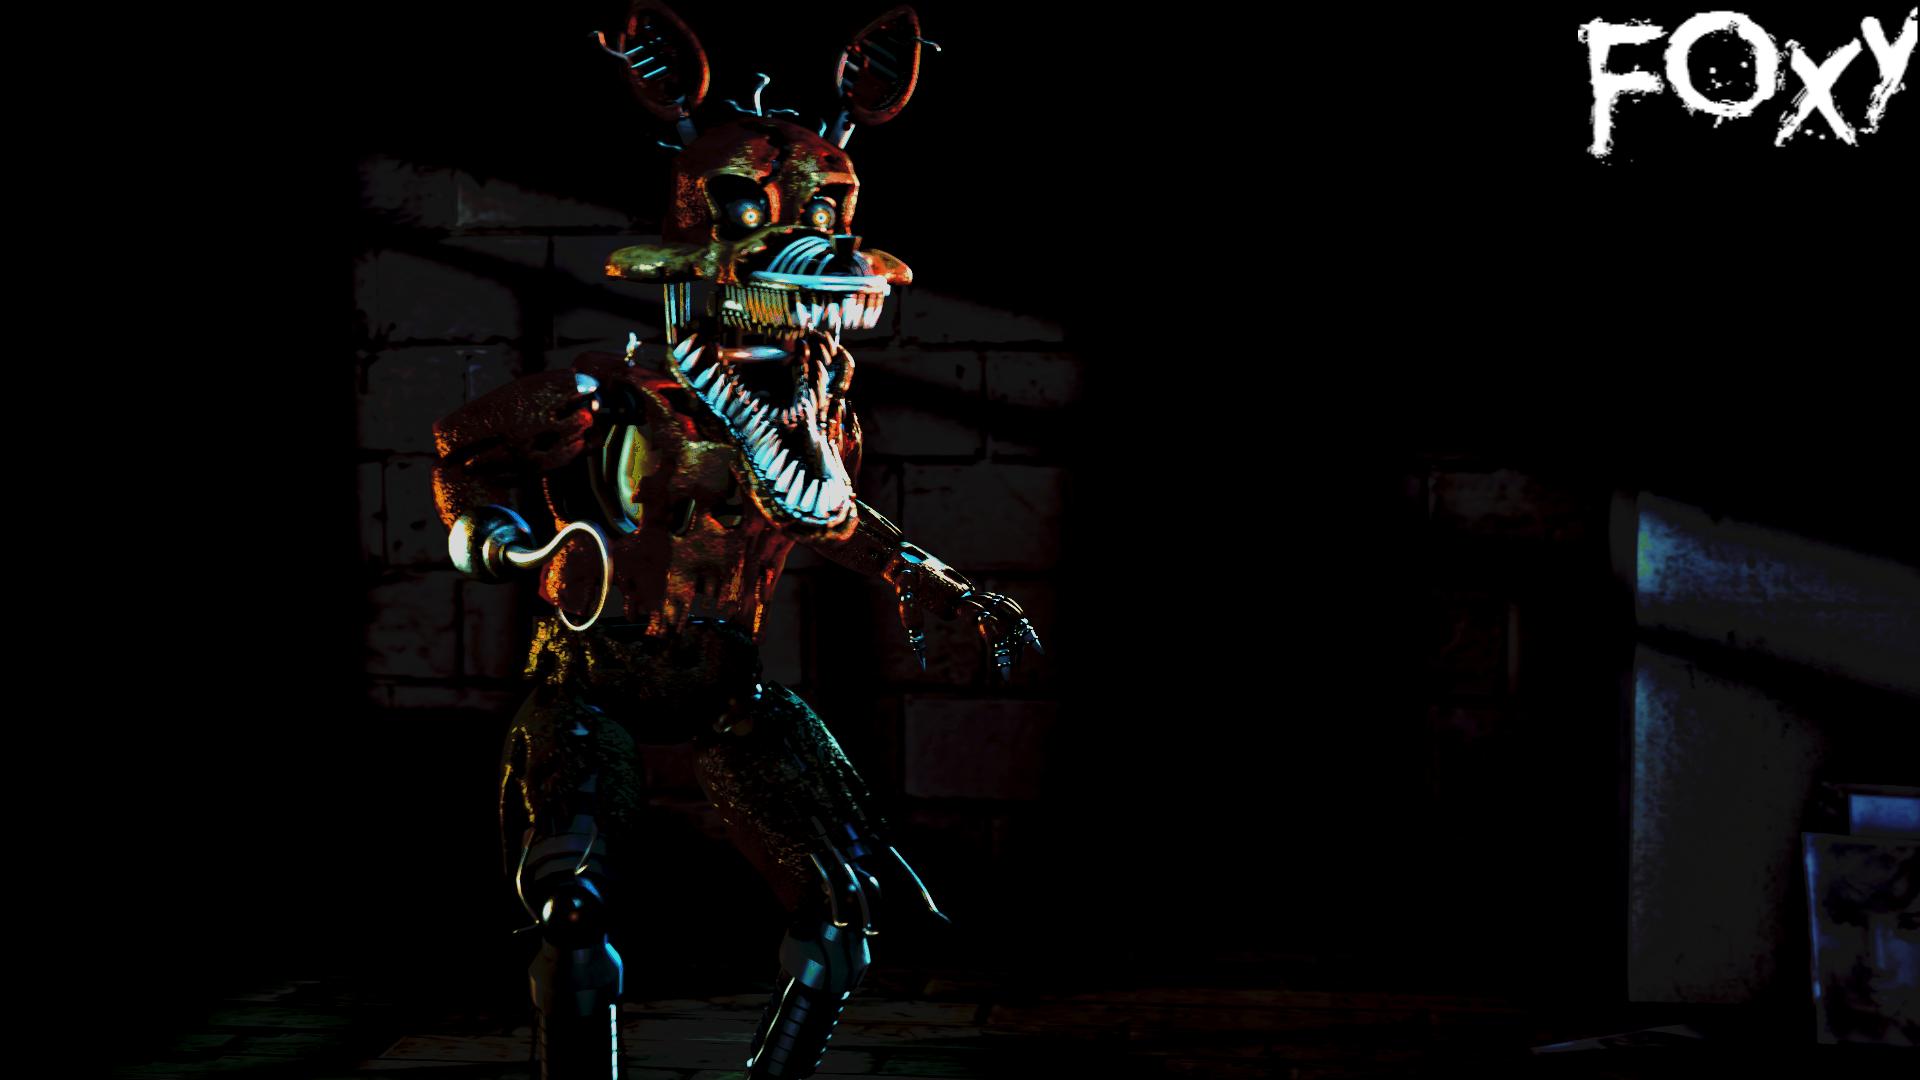 Nightmare Foxy by Purps1 on DeviantArt